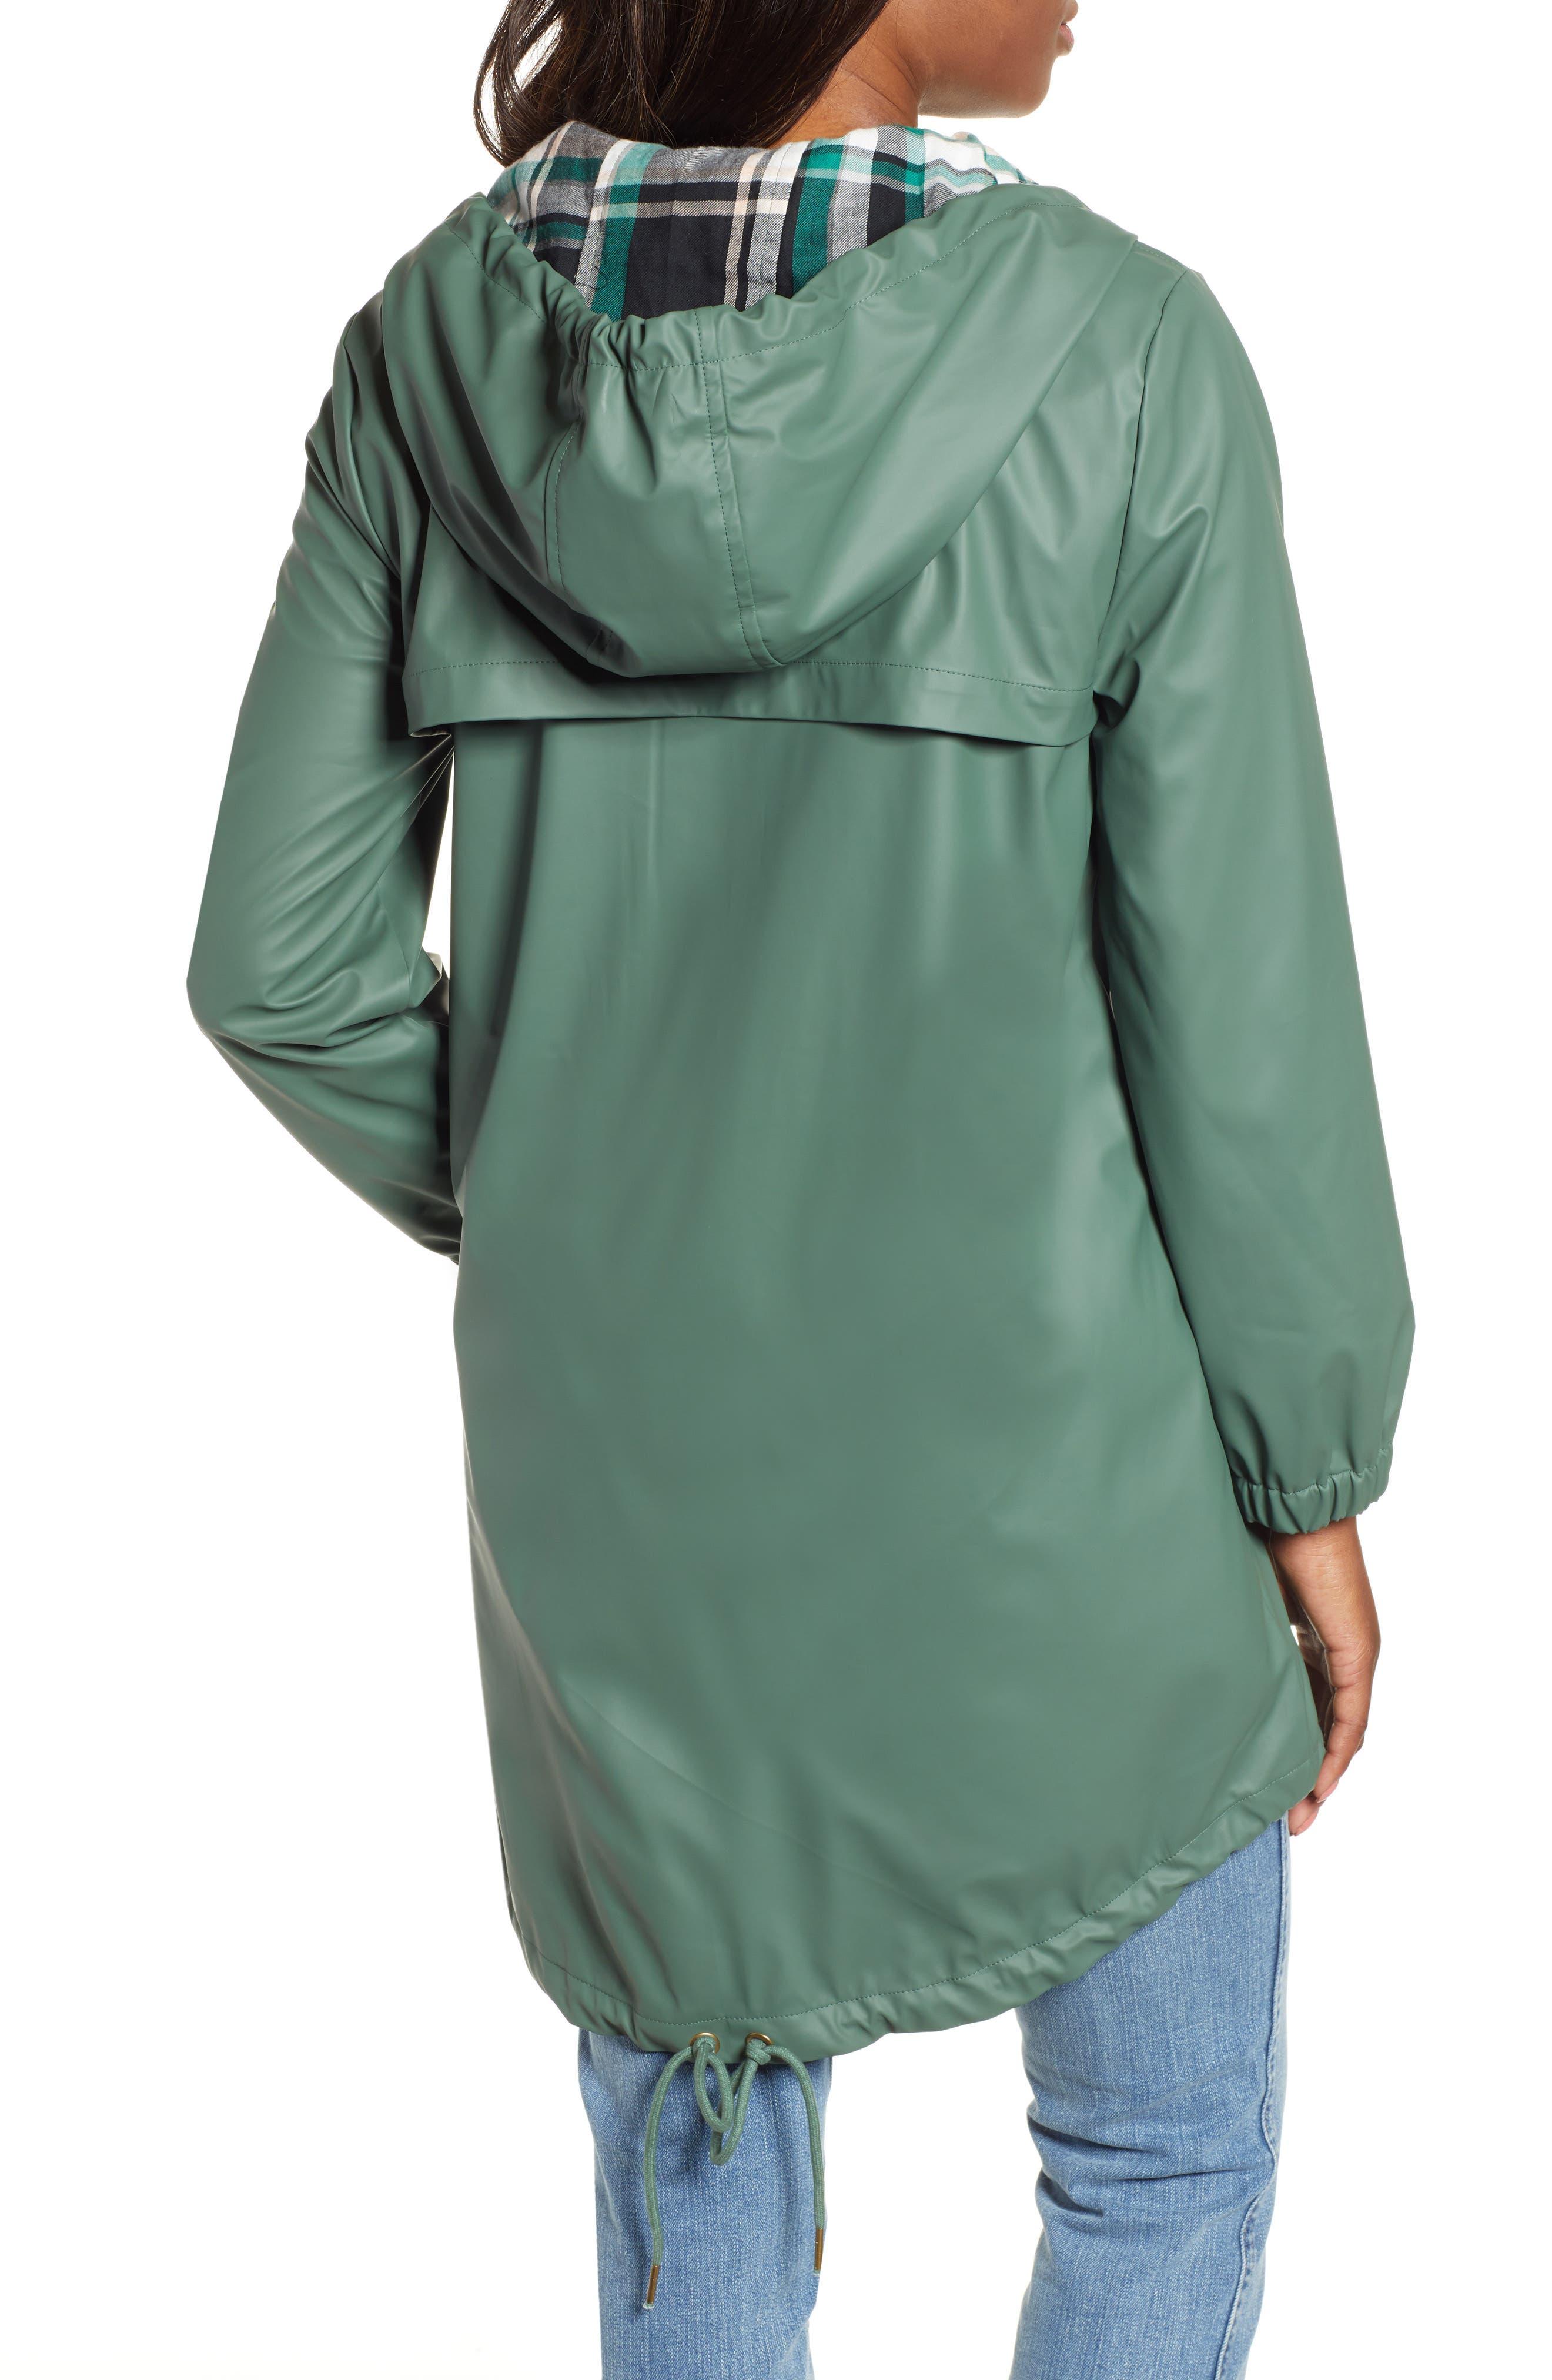 Hooded Rain Jacket,                             Alternate thumbnail 2, color,                             310